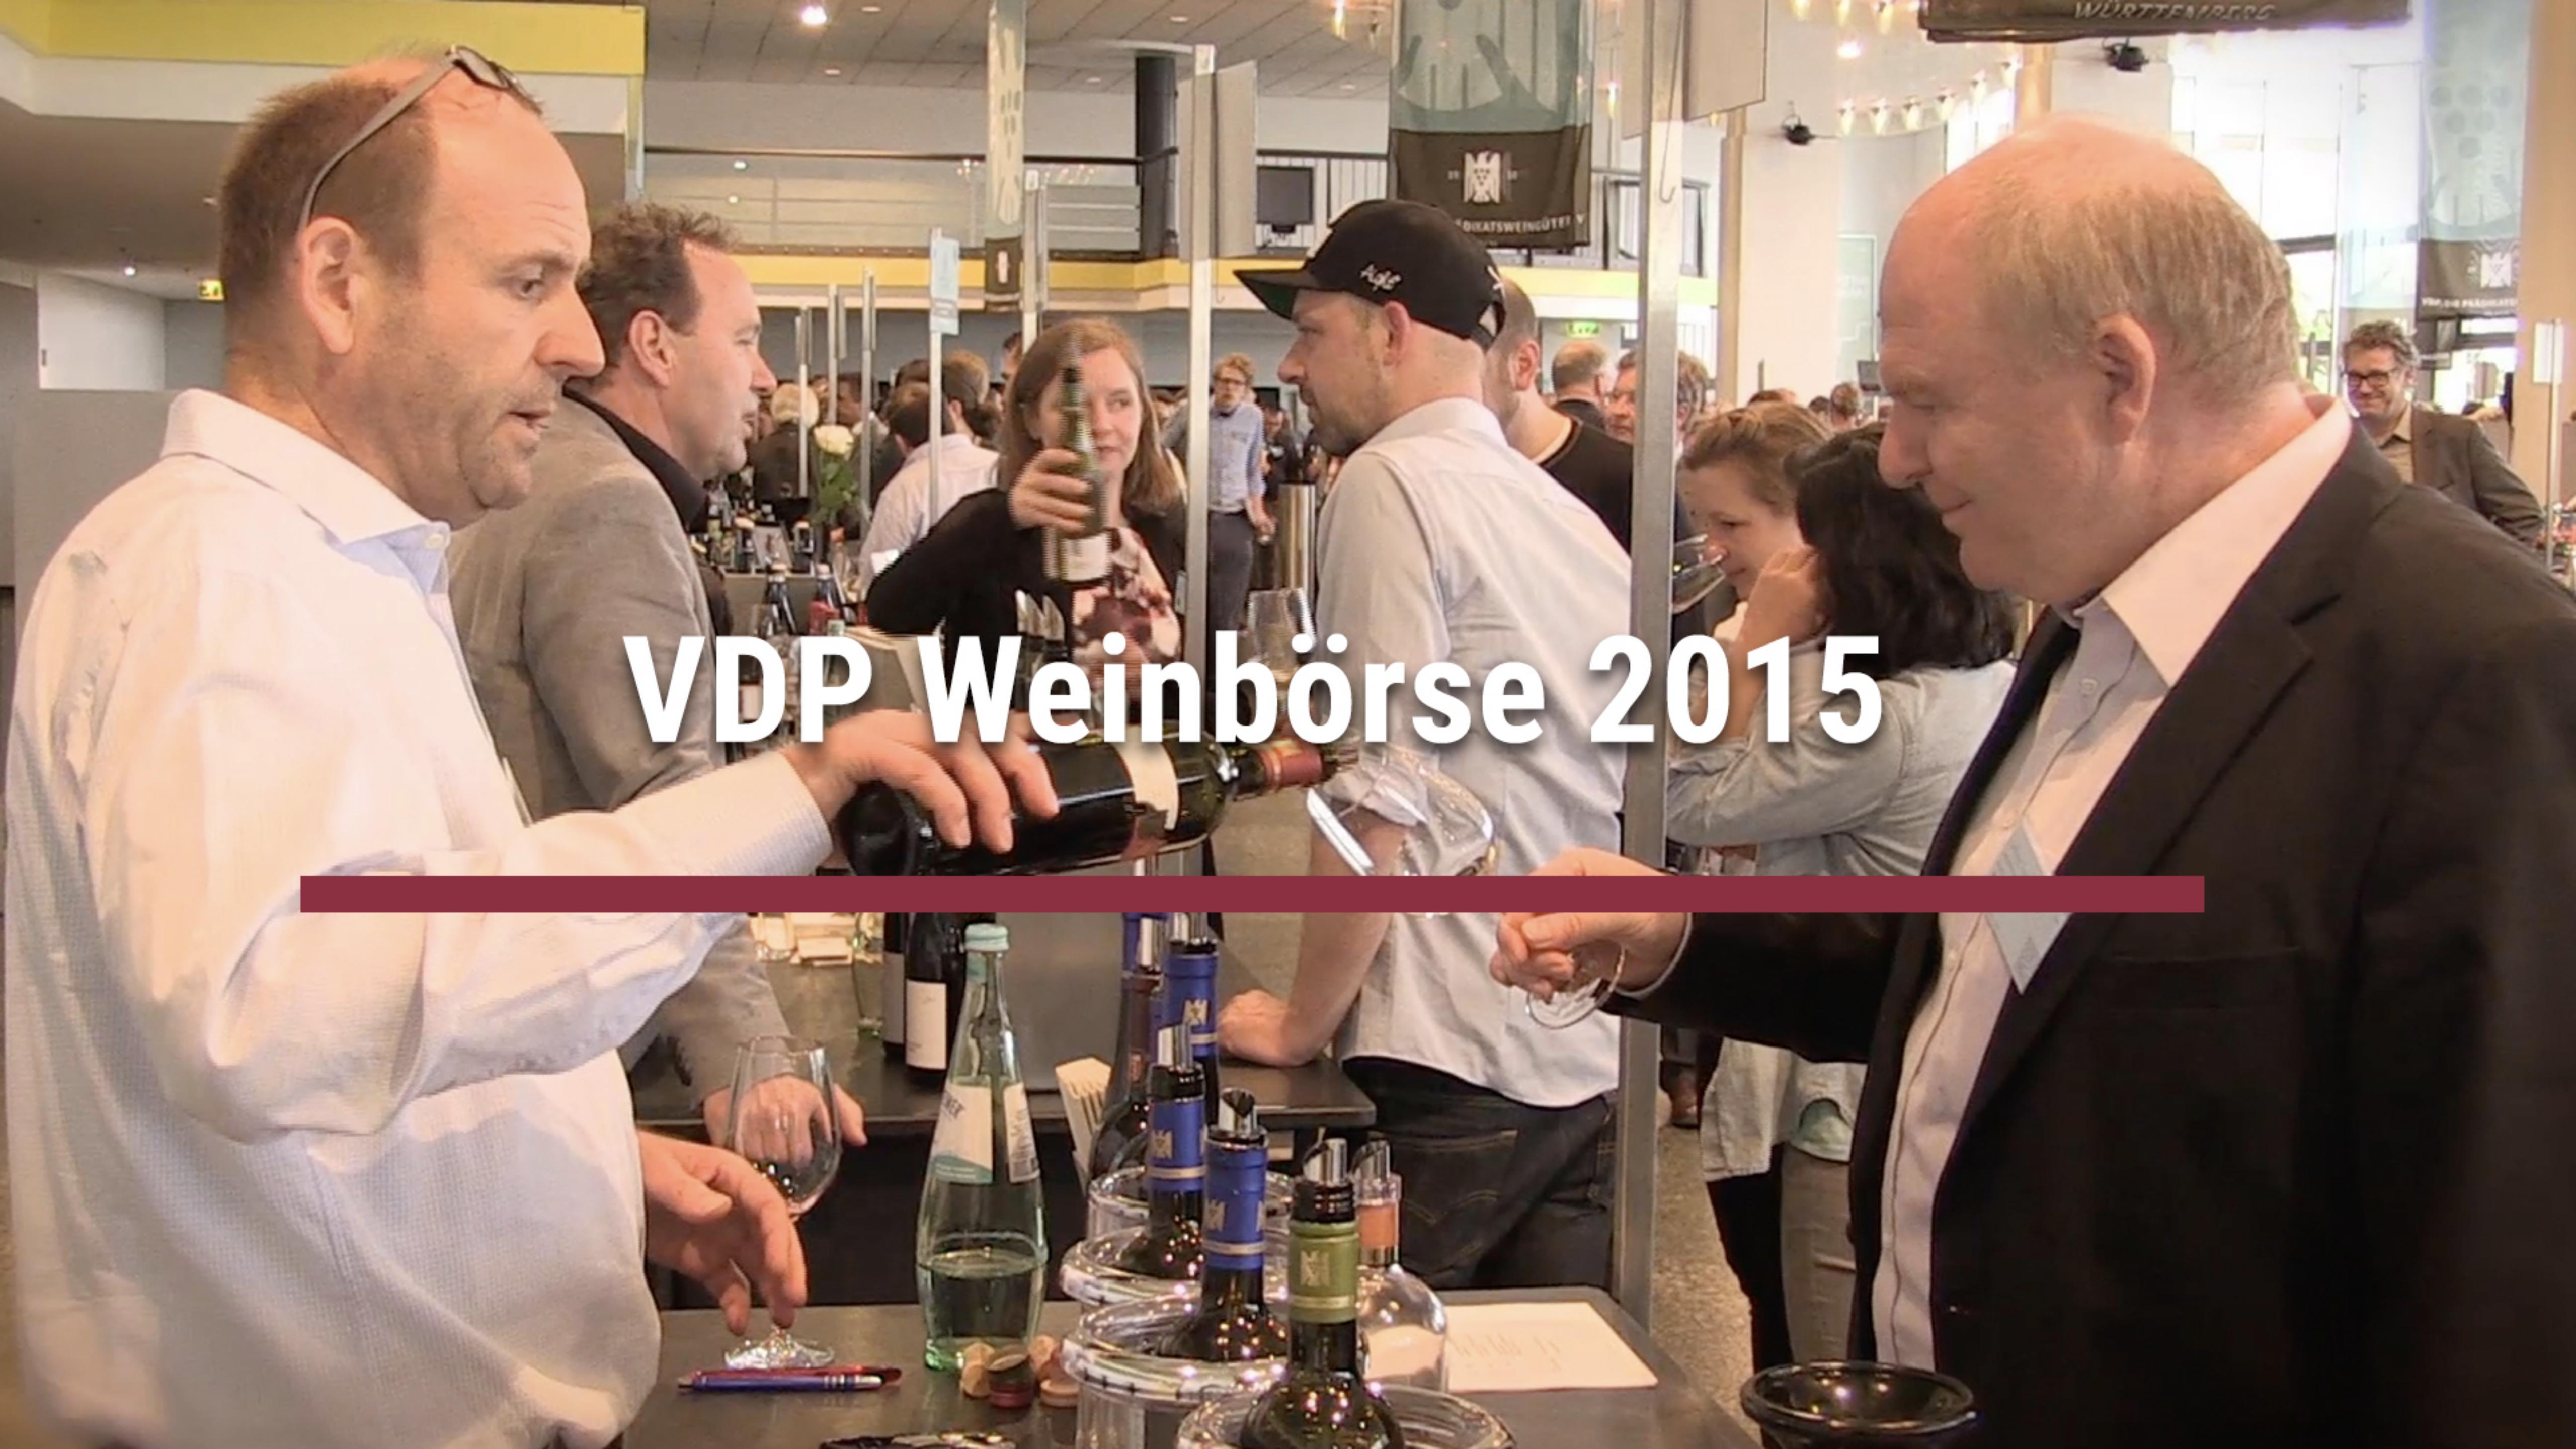 VDP Weinbörse 2015